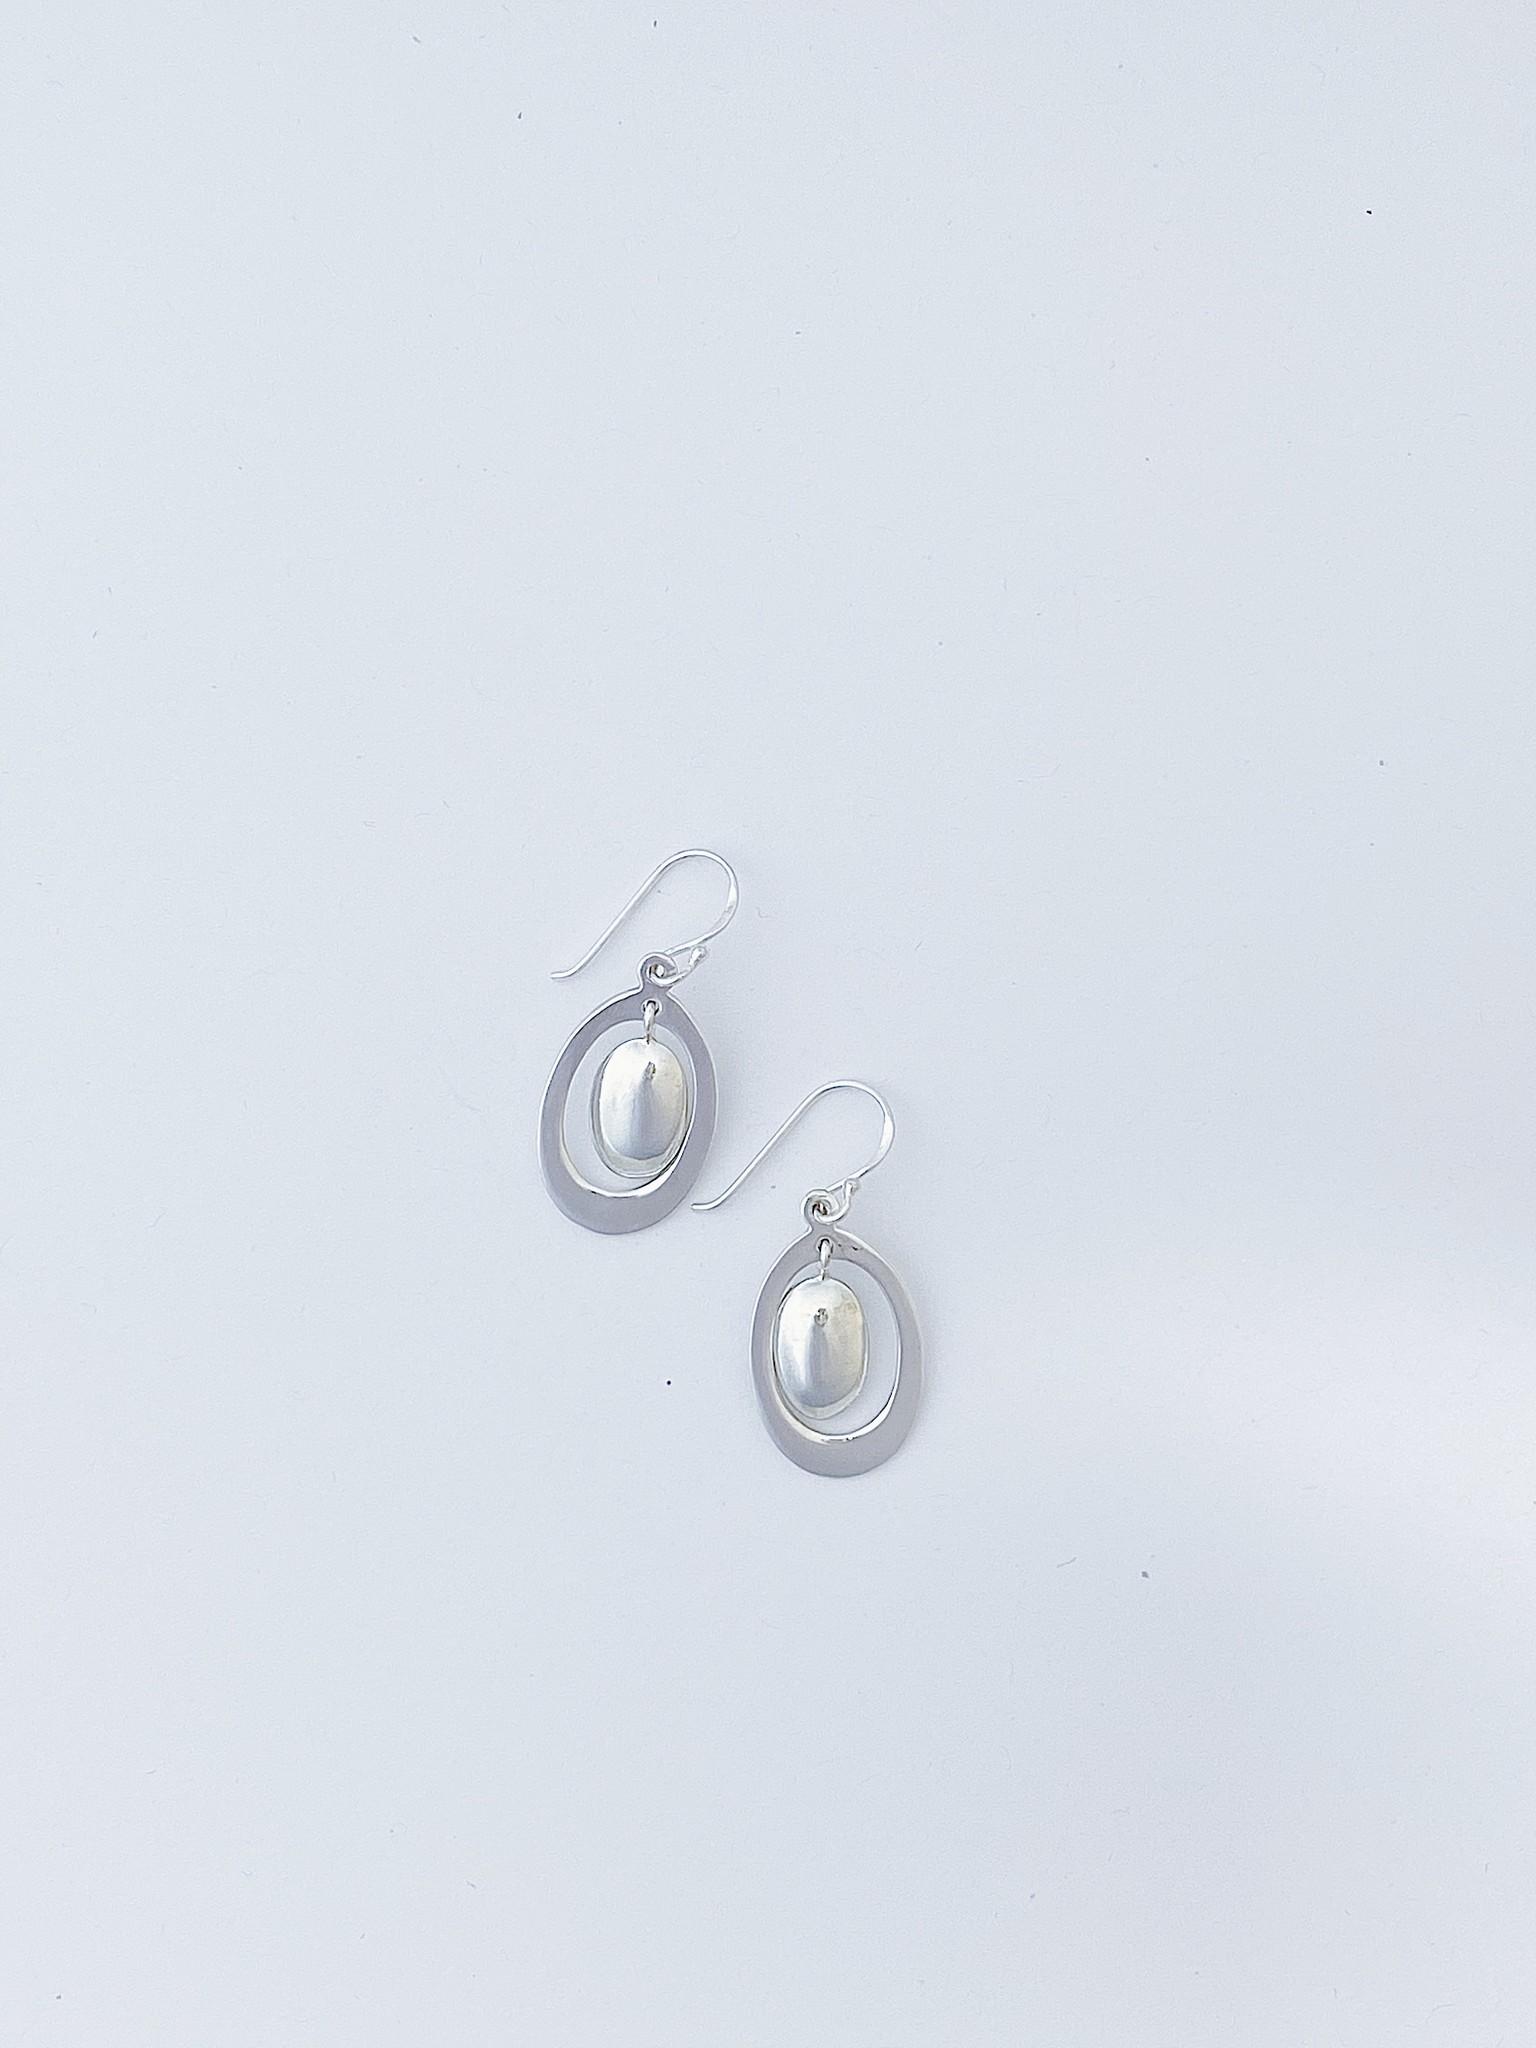 Bamiyan Oval Drop w Centre Dangle Earring